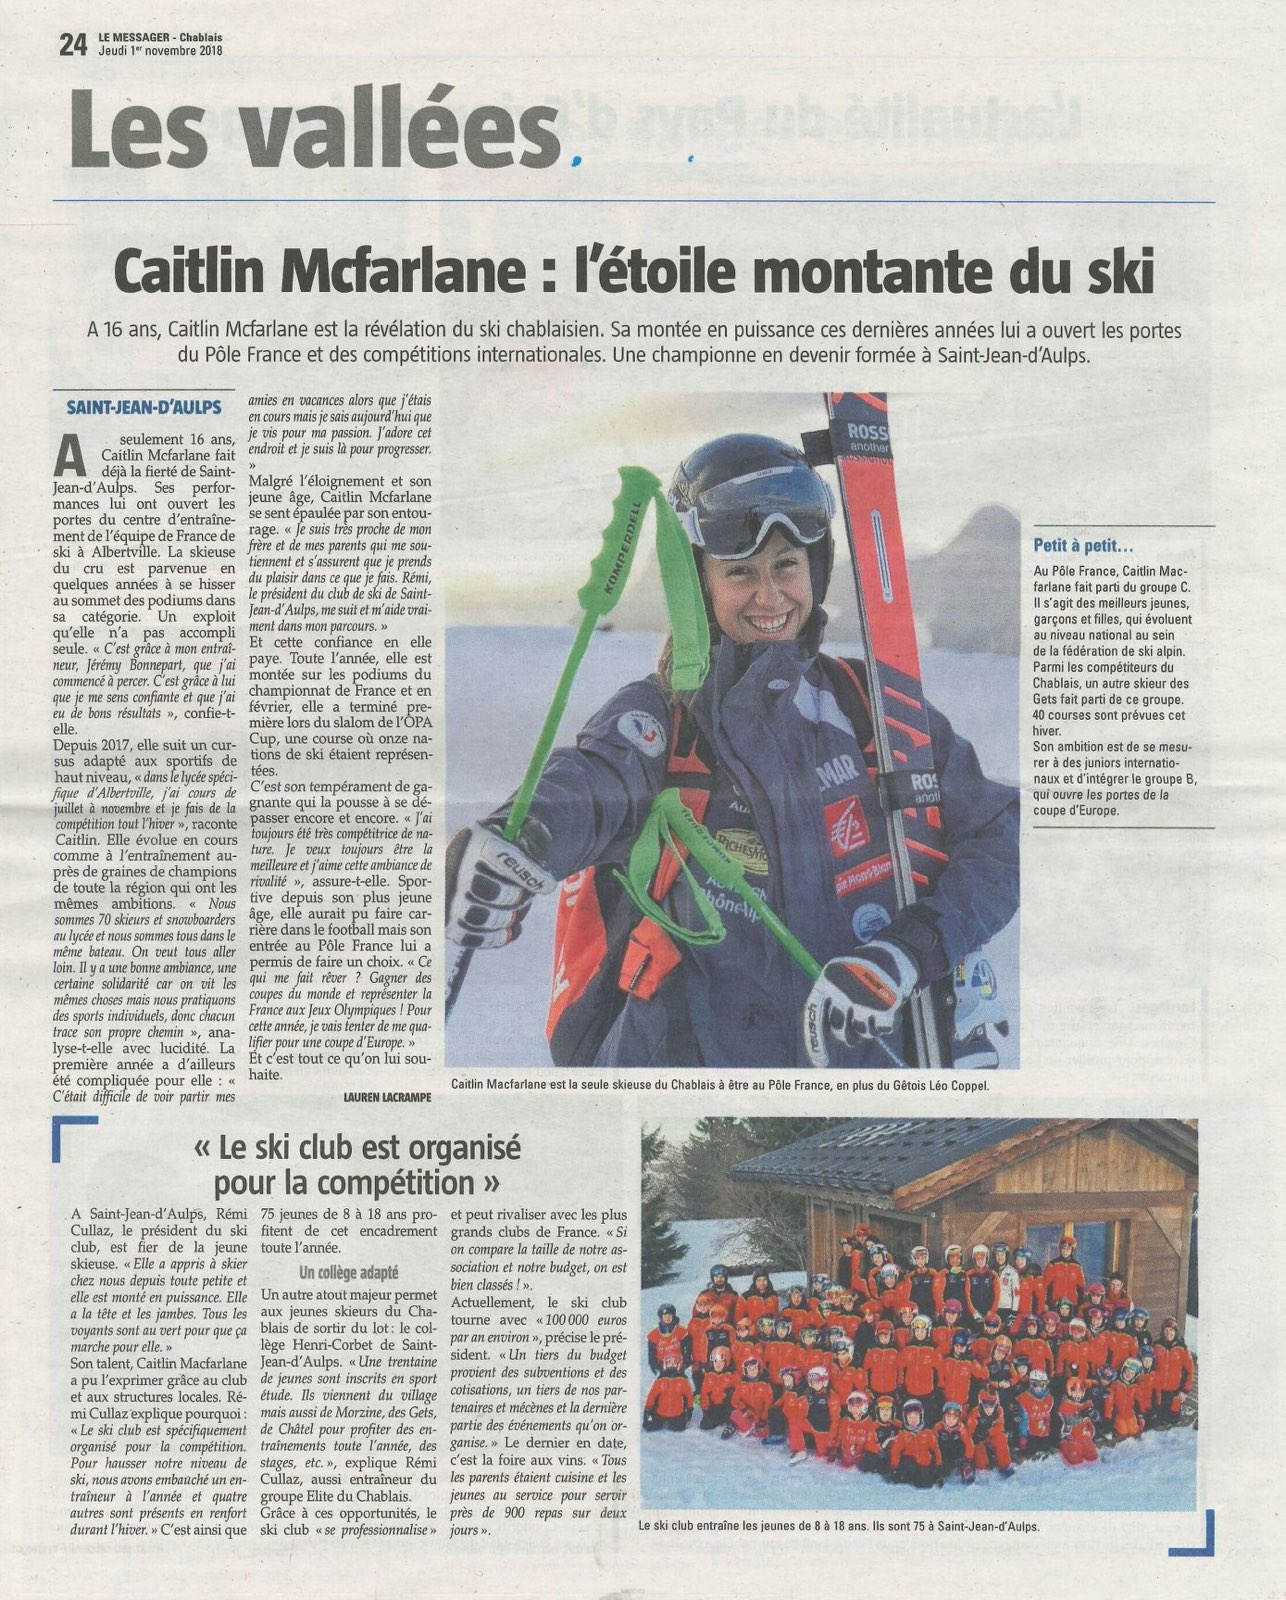 Article de presse - Caitlin McFarlane